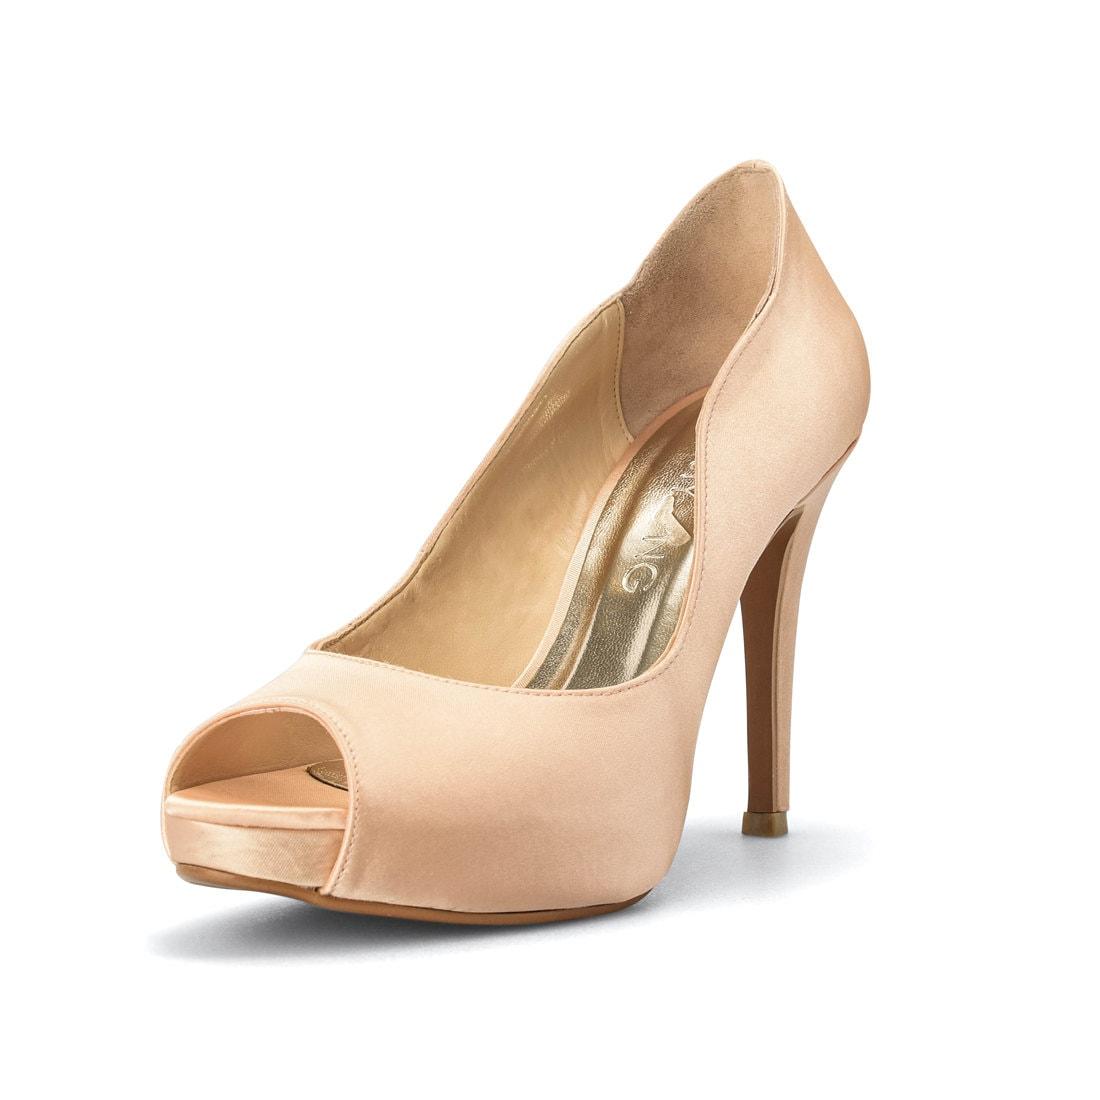 b5827226913e Champagne Gold Wedding Heels Gold Satin Bridal Peep Toe